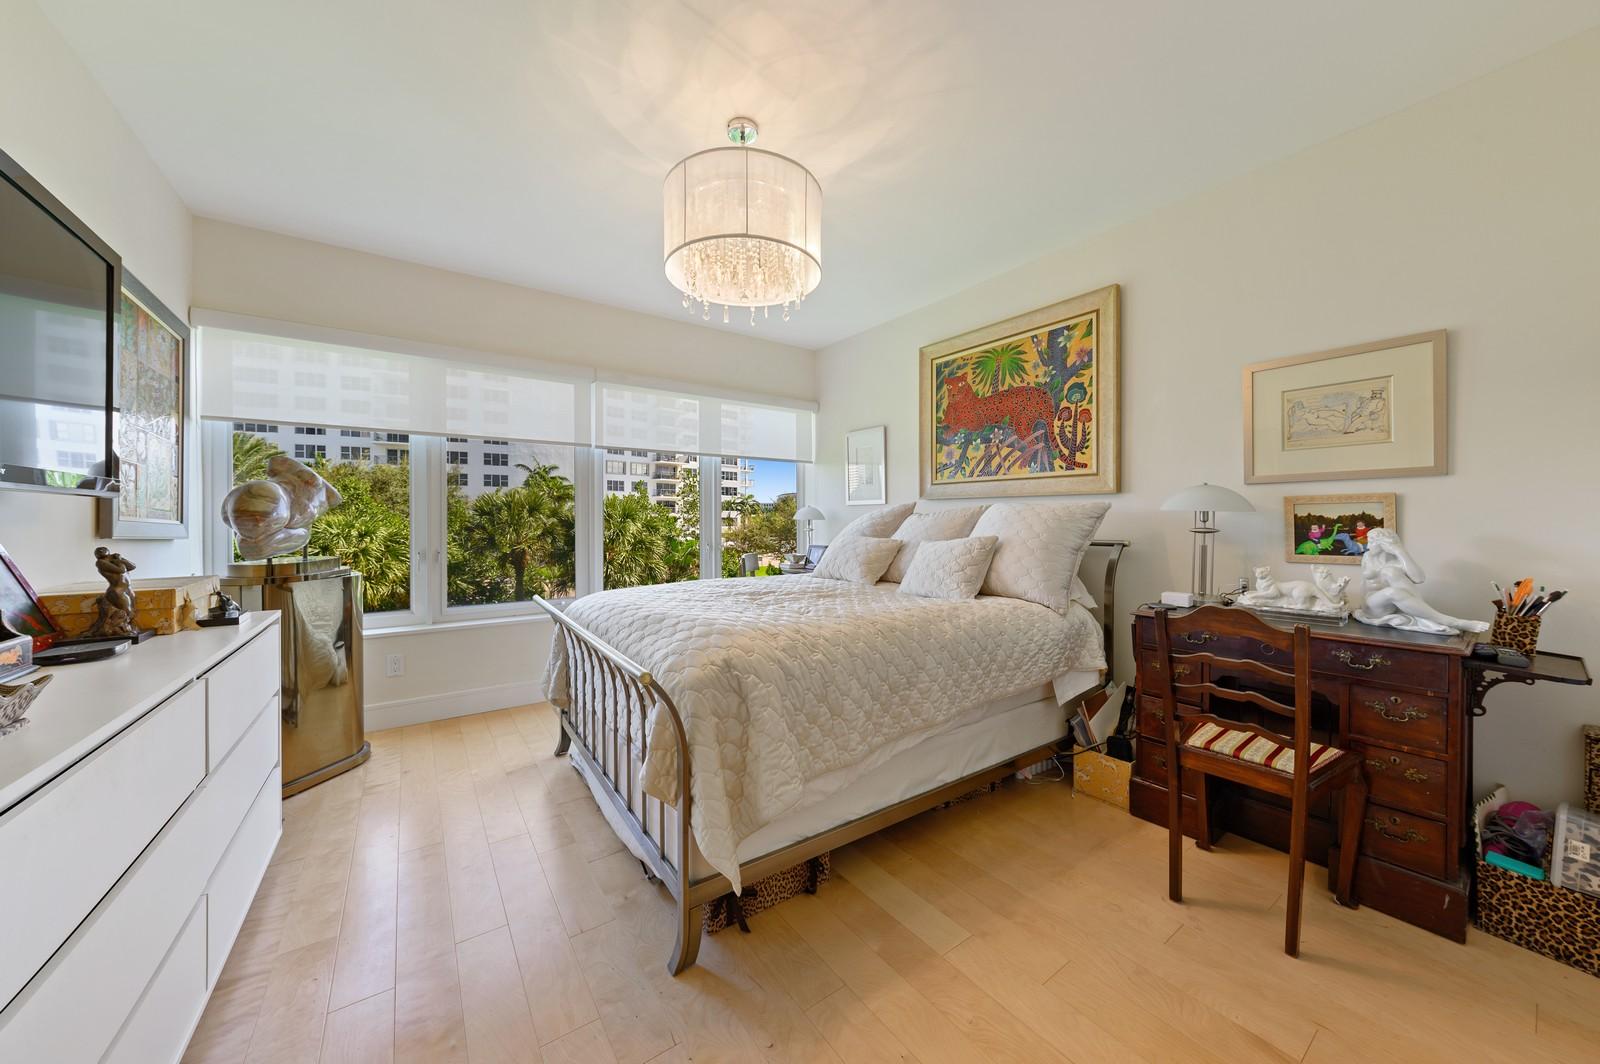 Real Estate Photography - 701 E. Camino Real, #3-C, Boca Raton, FL, 33432 - Master Bedroom